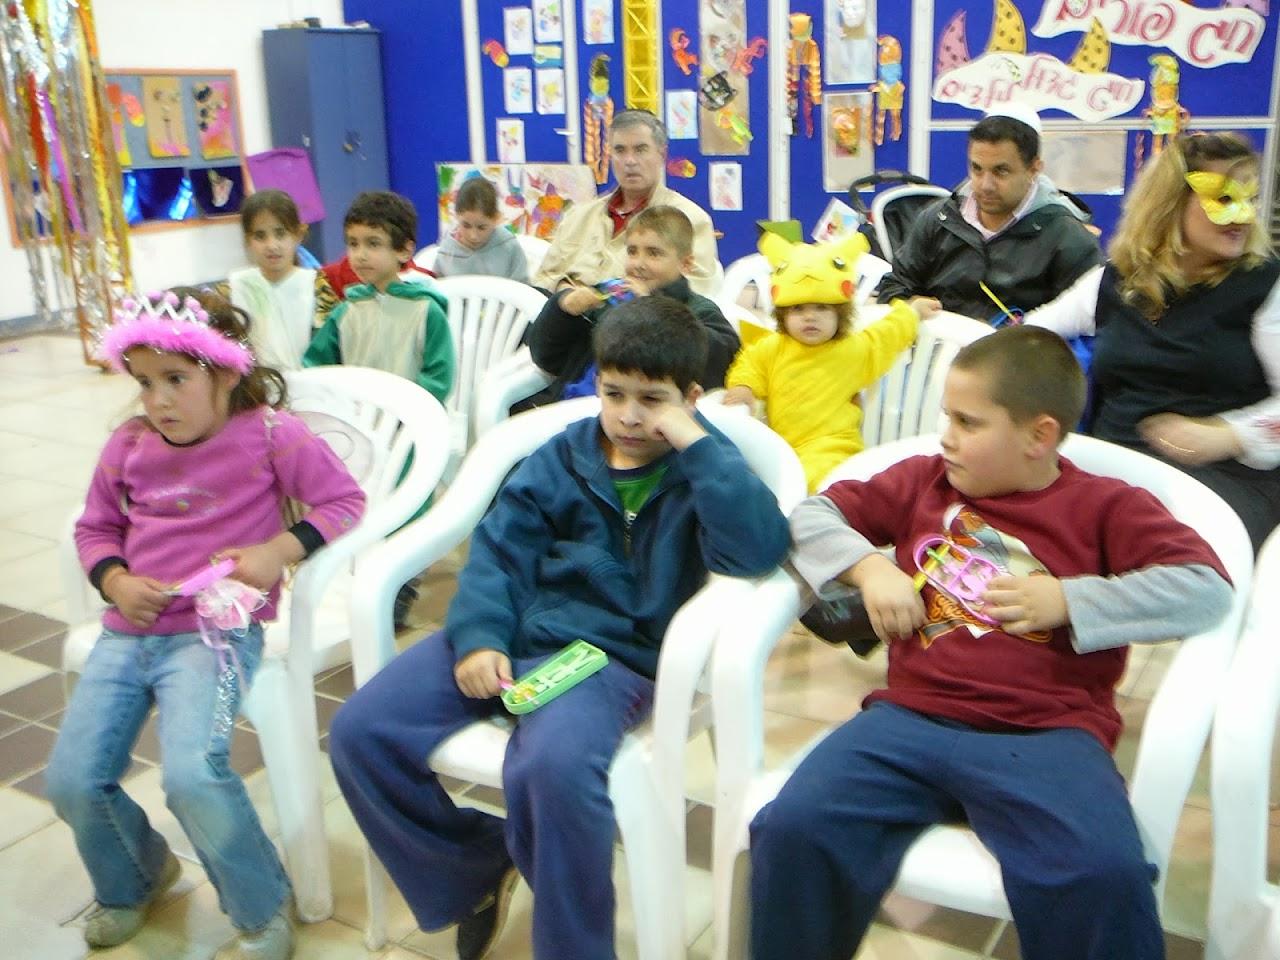 Purim 2007  - 2007-03-03 12.38.24.jpg